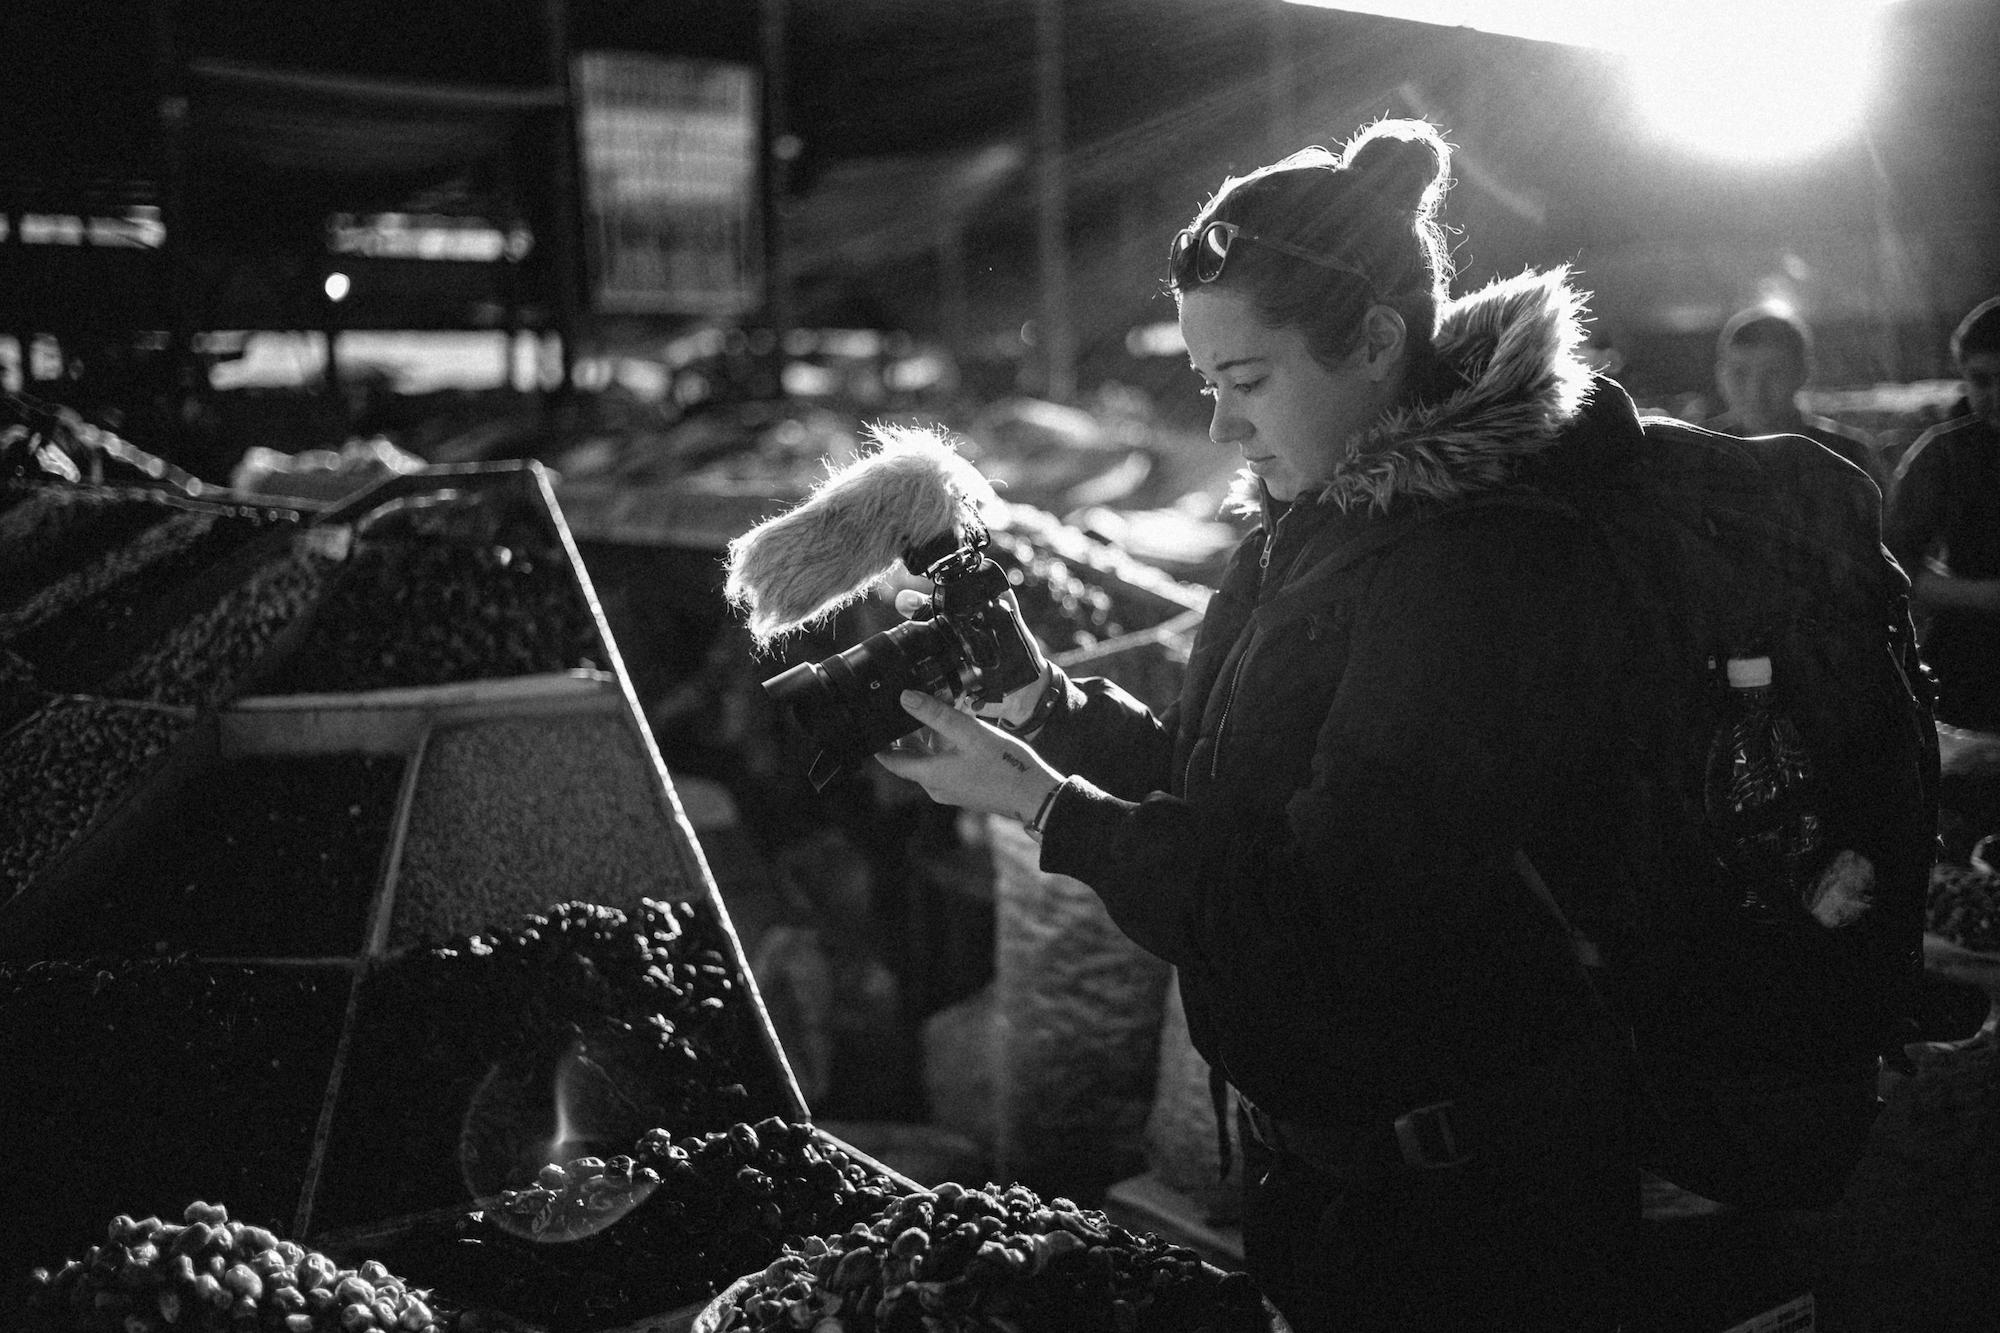 série documentaire humanité olivia kohler